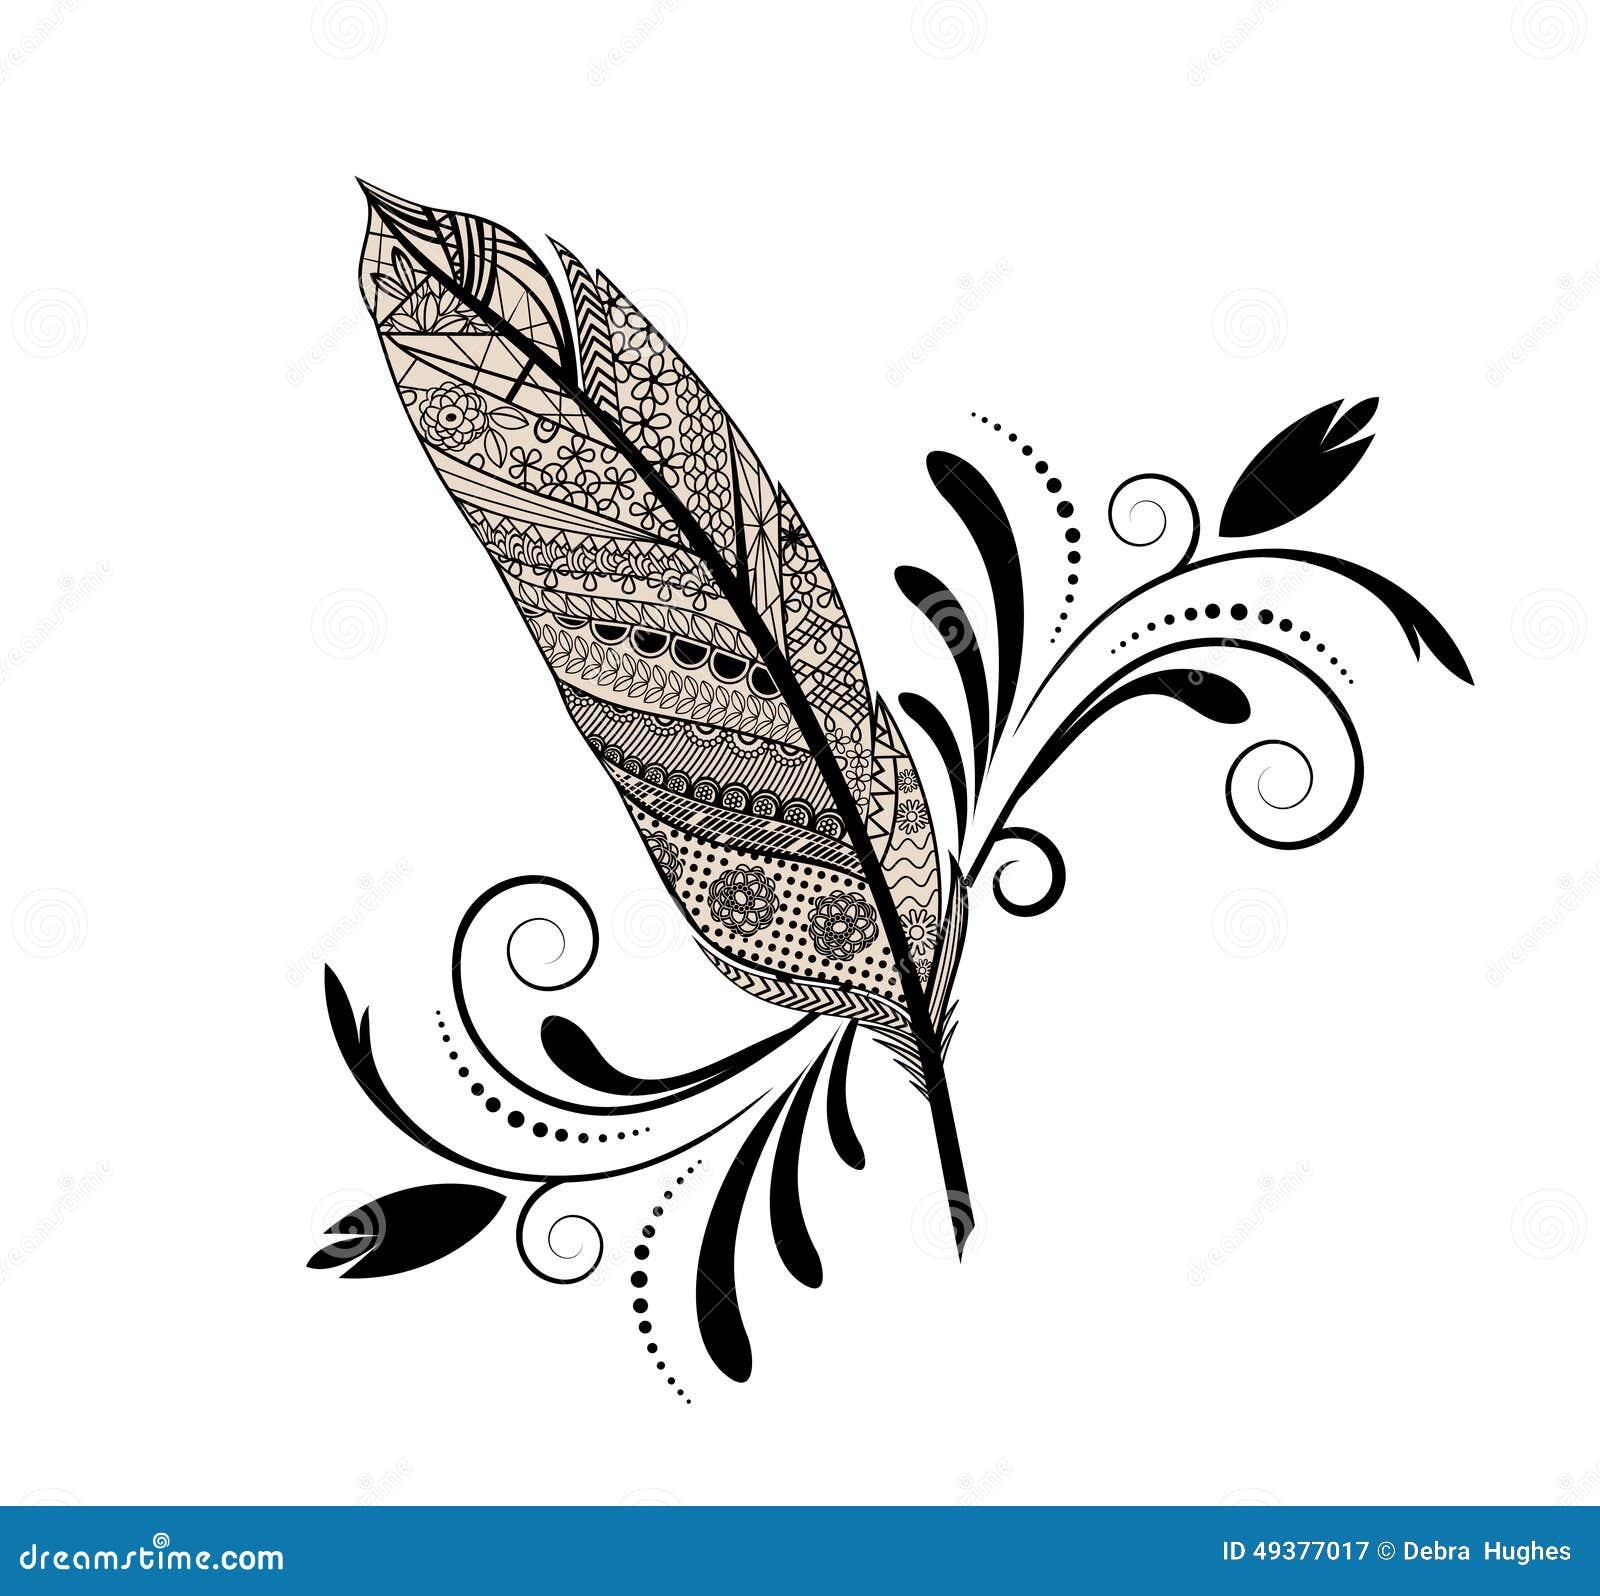 Graphic design feather stock vector. Image of flourish